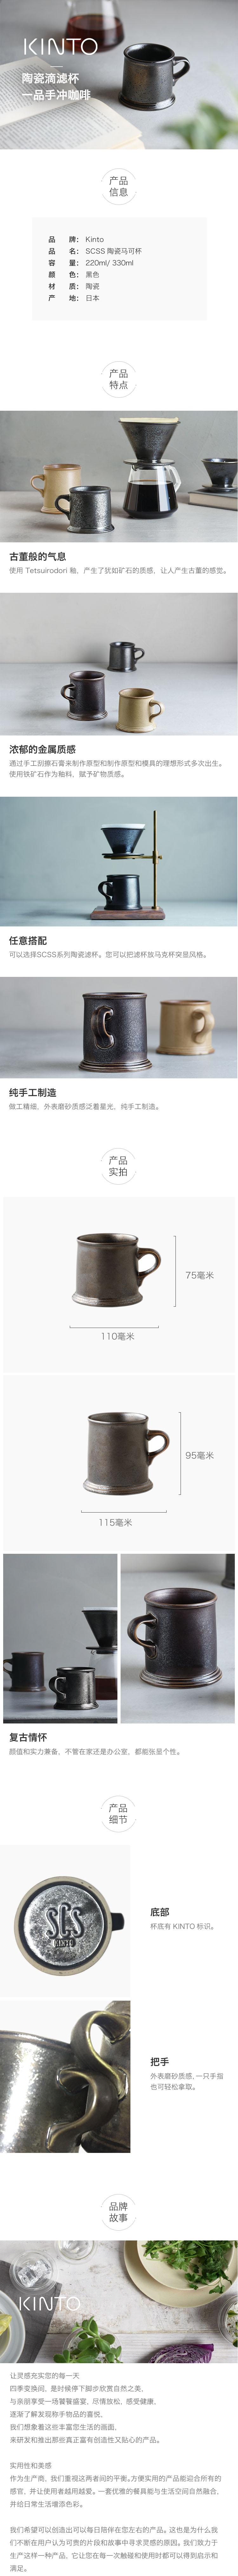 SCSS陶瓷马克杯